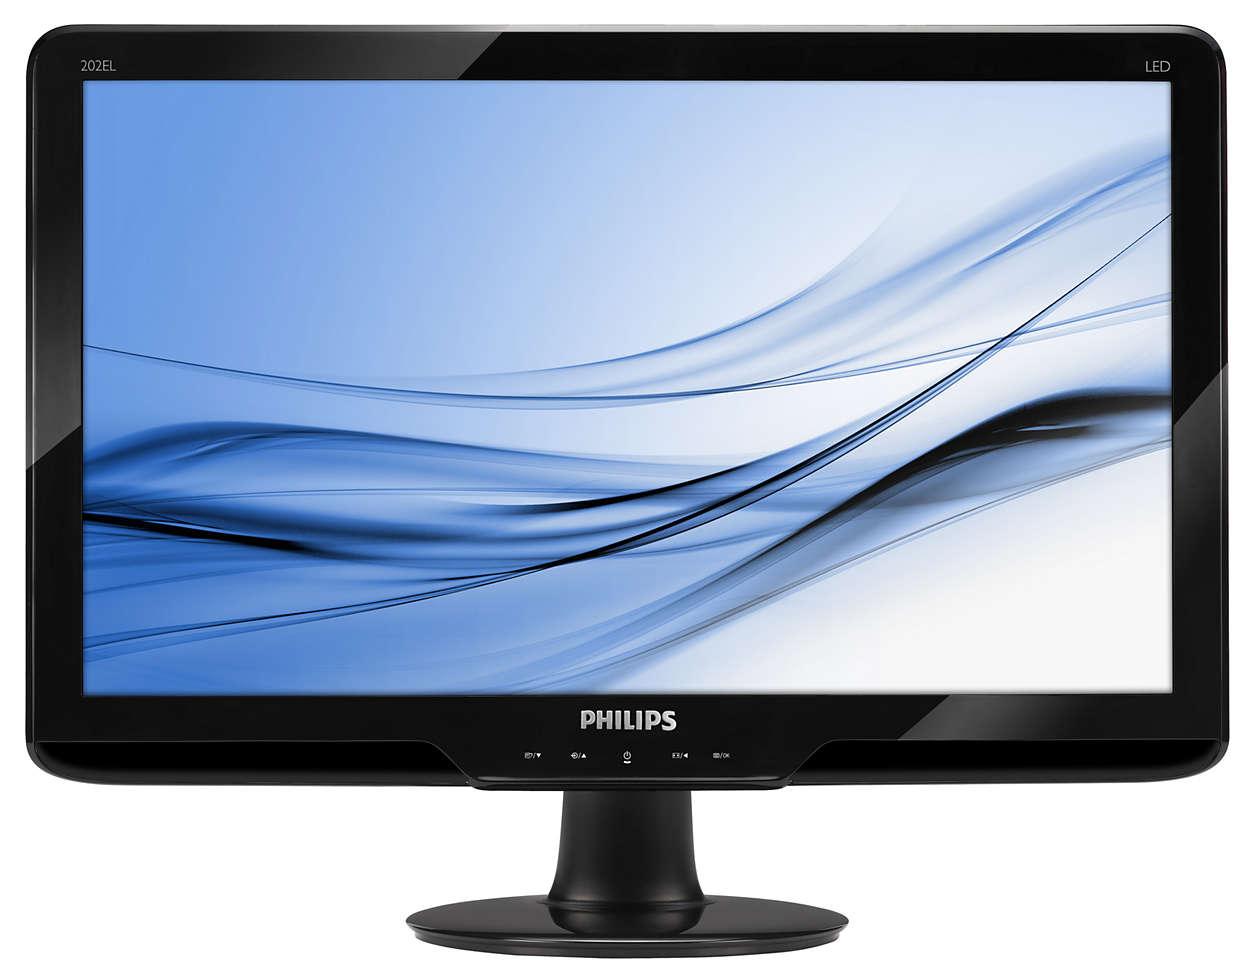 Écran 16/9 HD finition glossy avec commandes SmartTouch